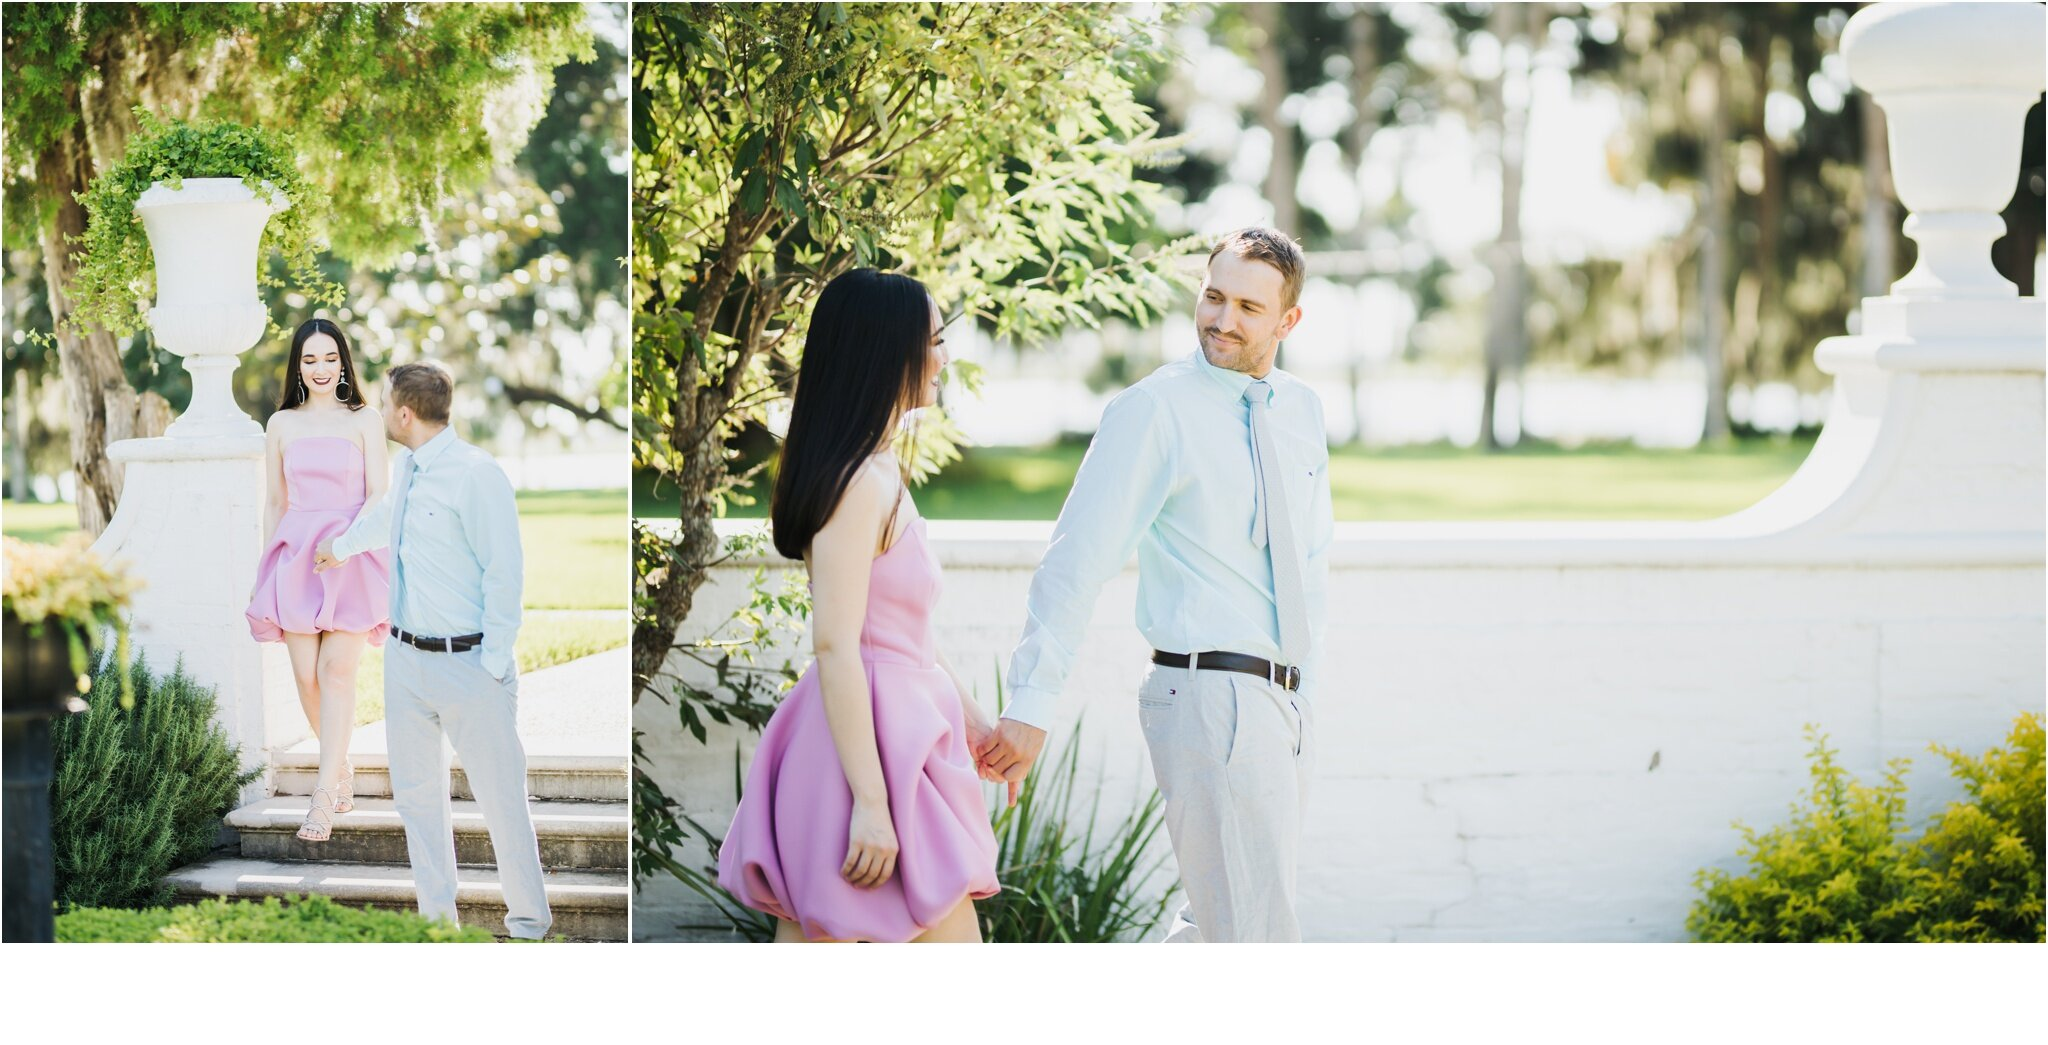 Rainey_Gregg_Photography_St._Simons_Island_Georgia_California_Wedding_Portrait_Photography_1823.jpg